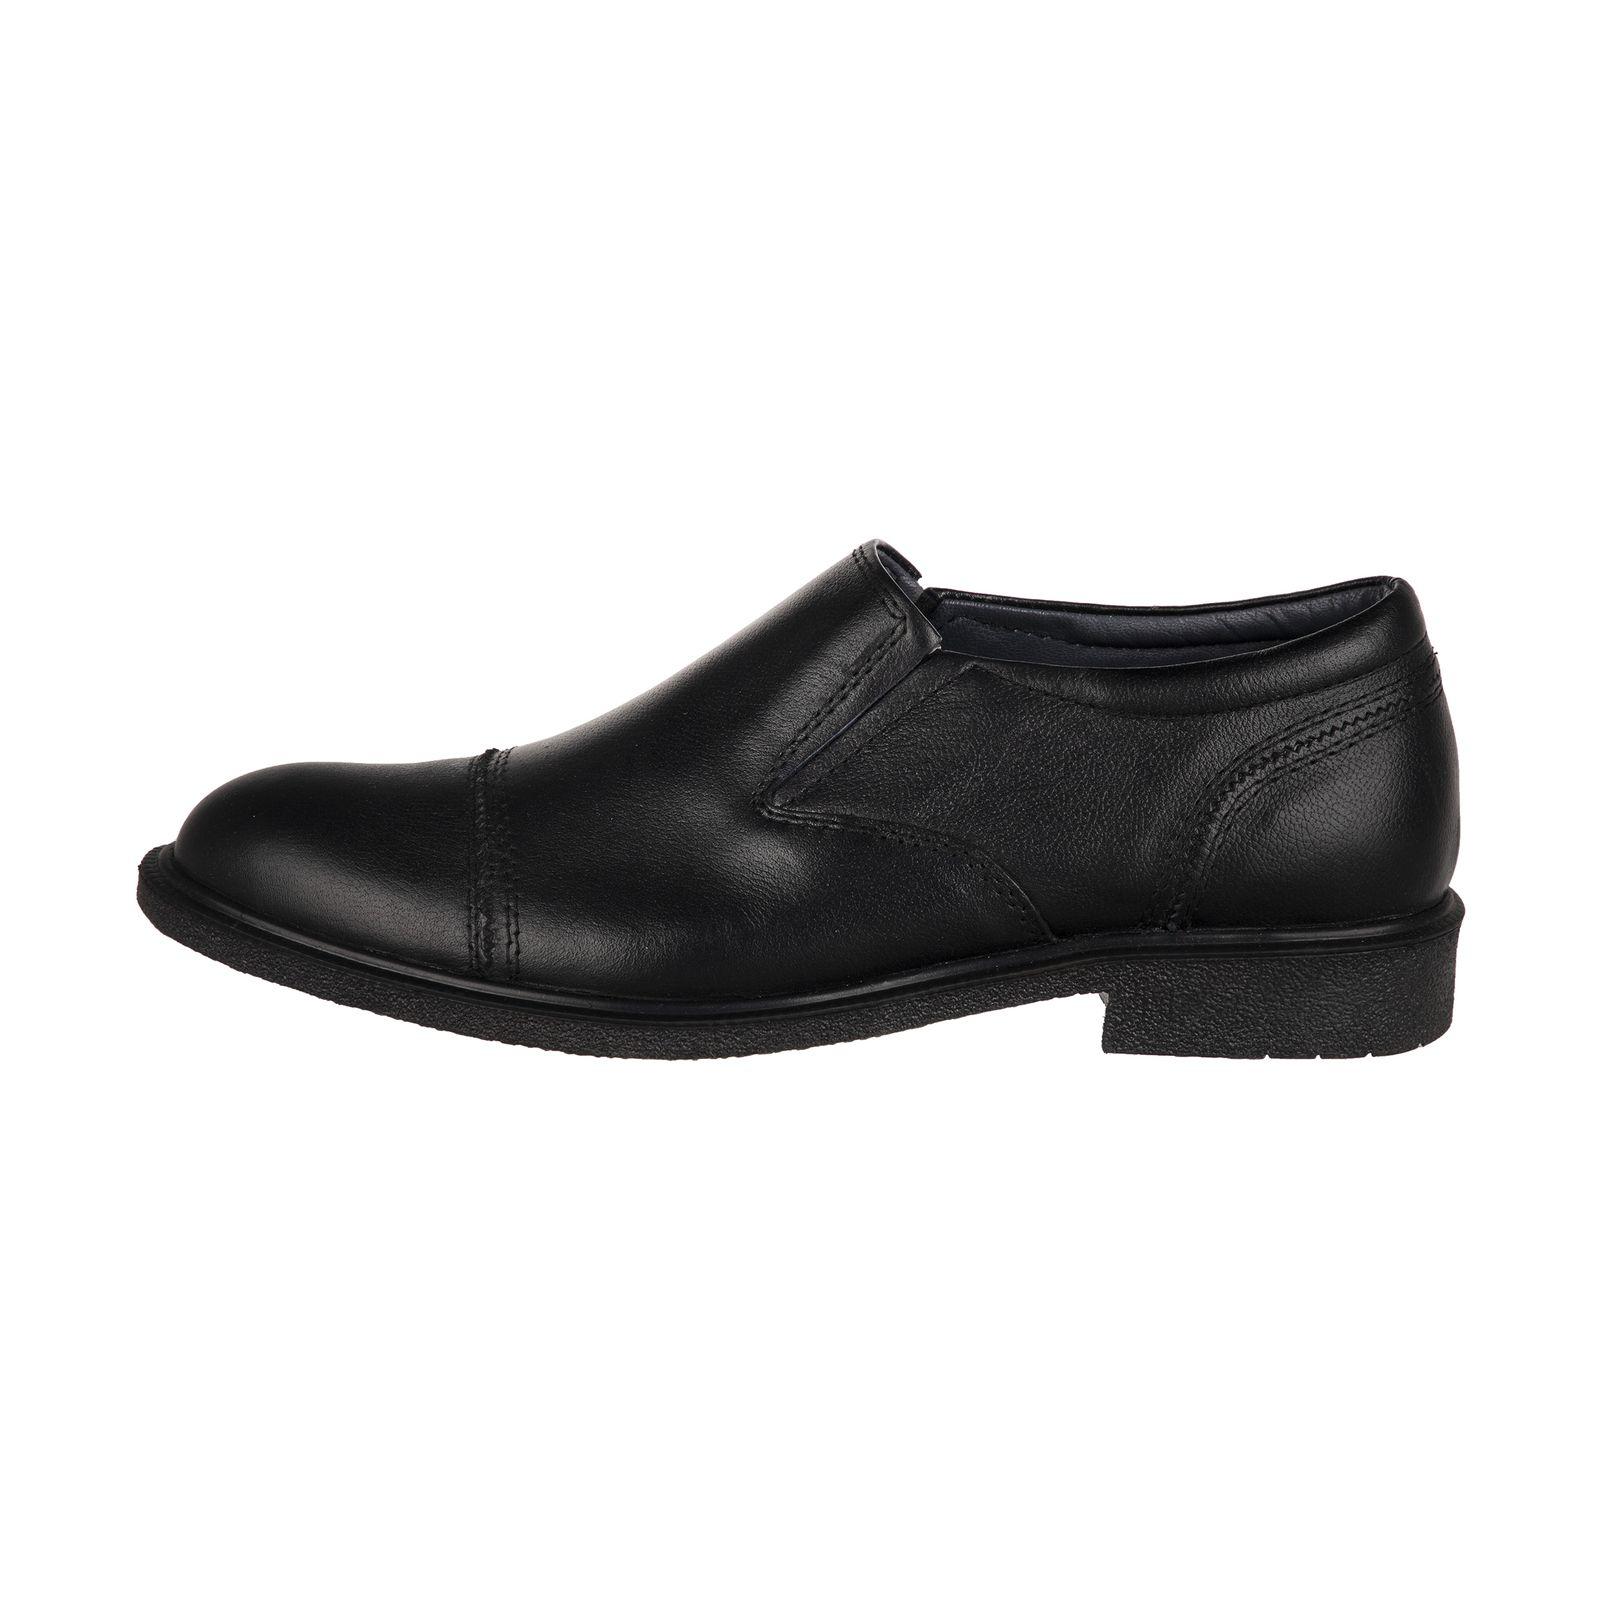 کفش مردانه سوته مدل 4870E503101 -  - 2